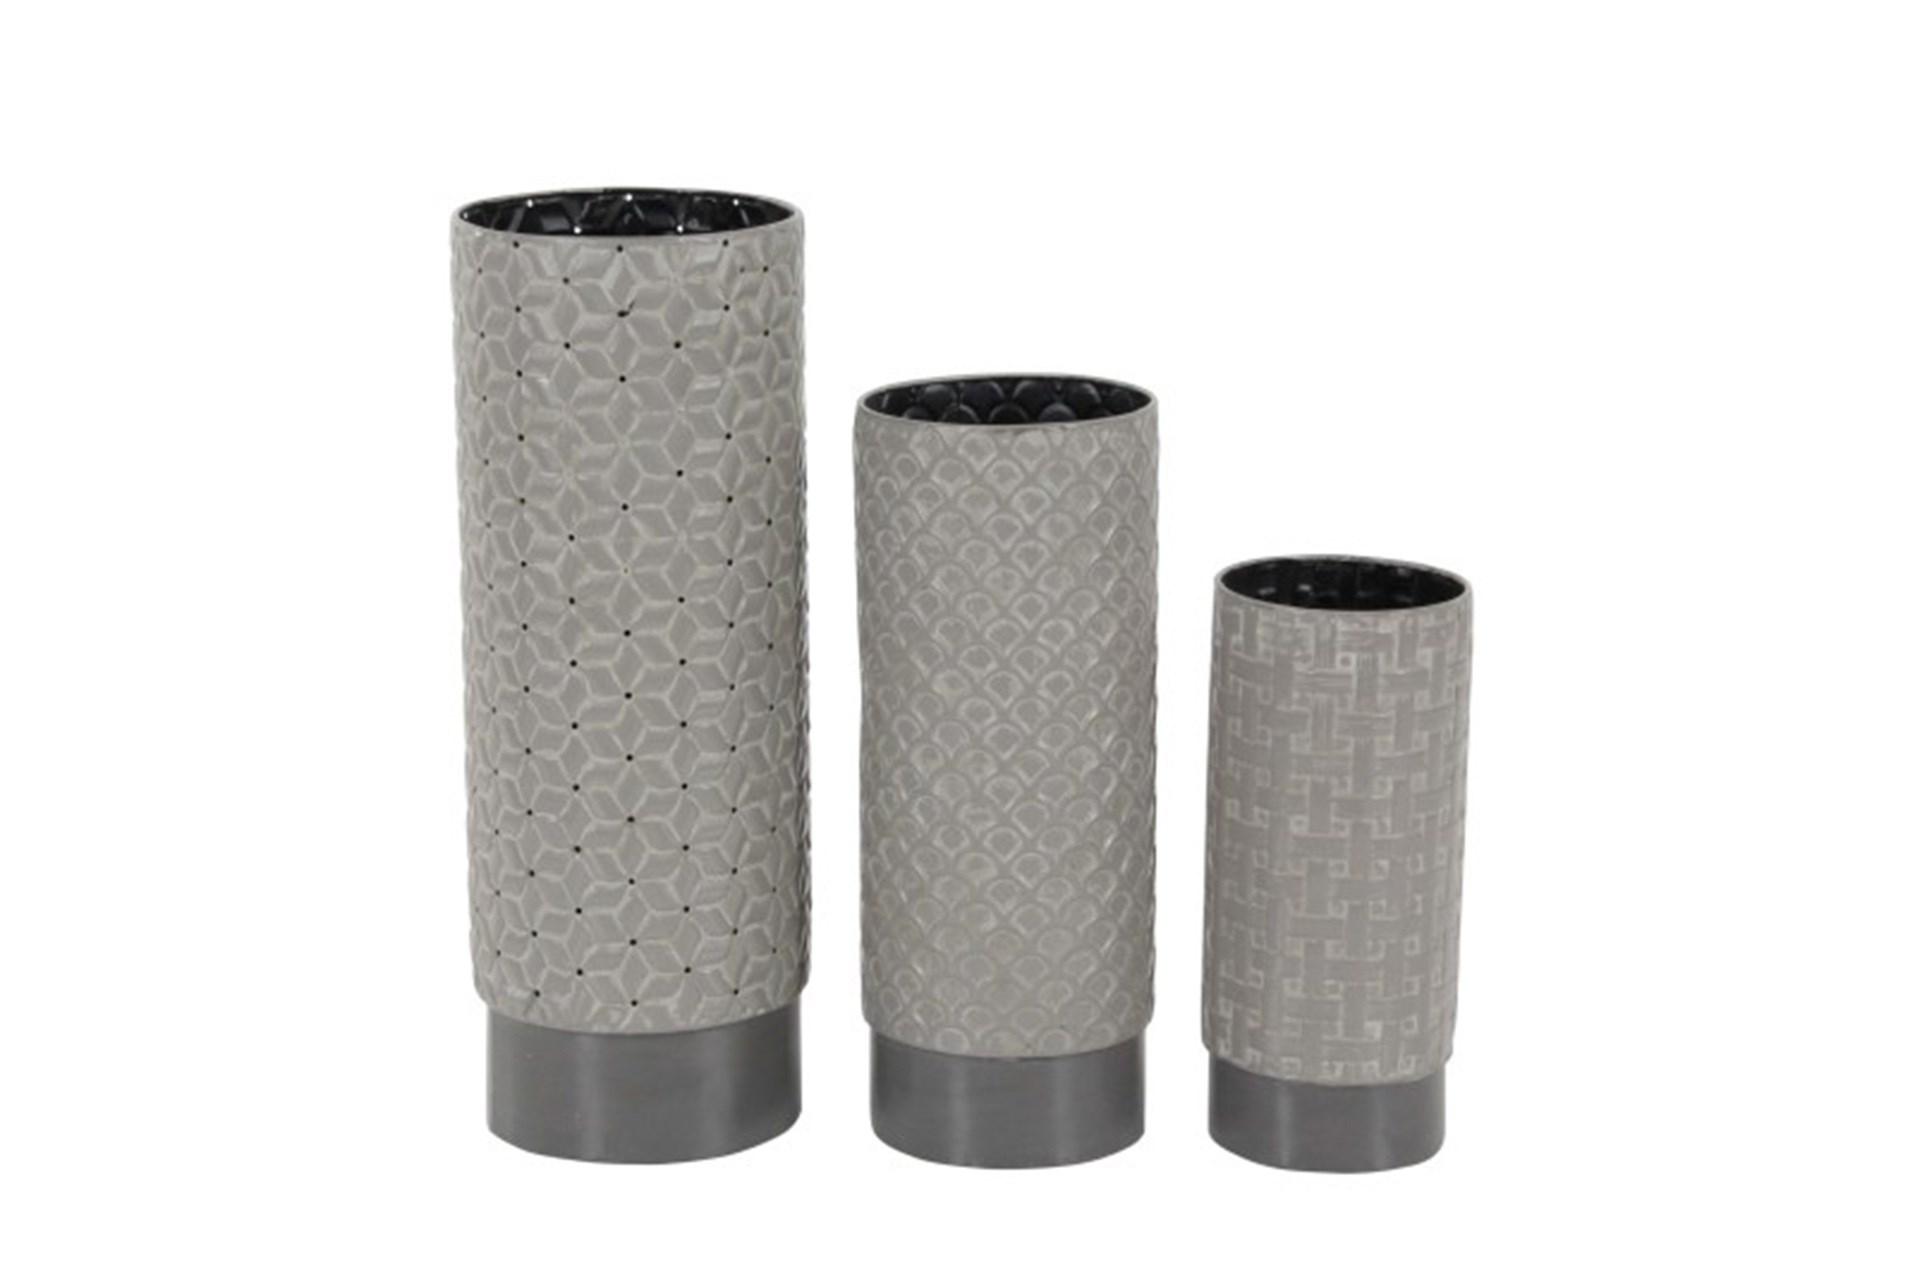 3 Piece Set Grey Texture Vases Living Spaces